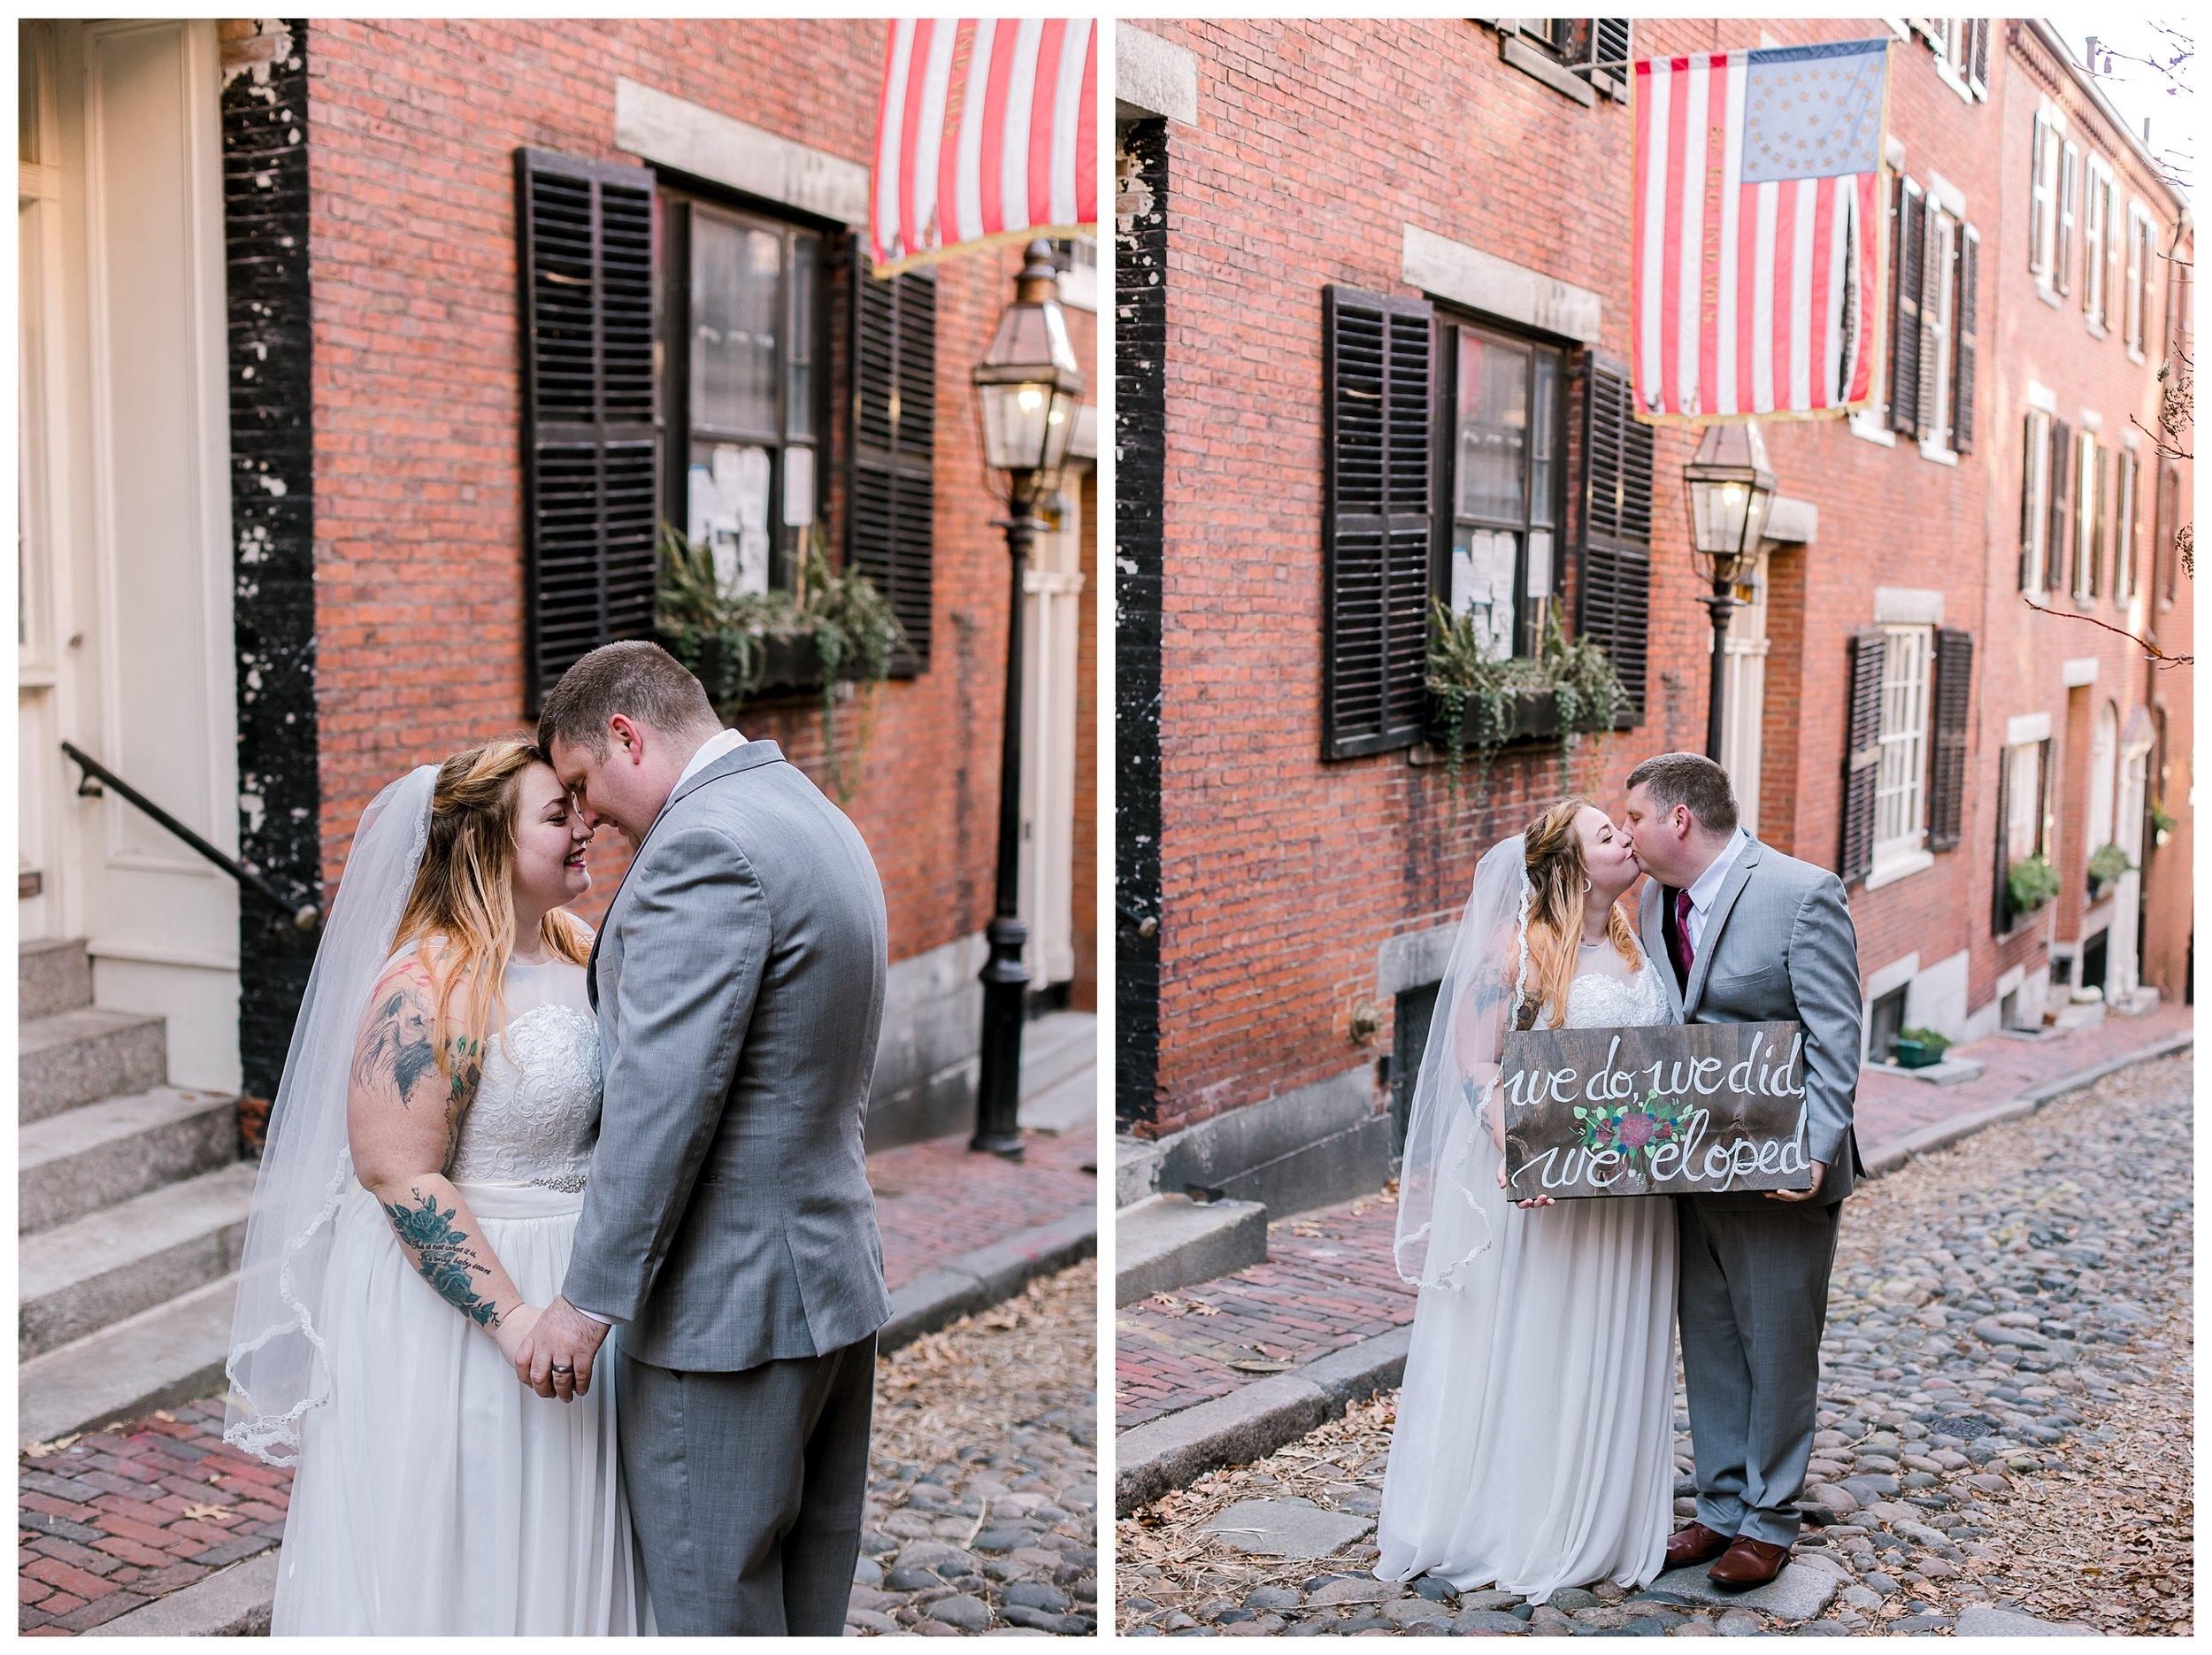 boston_acorn_street_elopement_photos_erica_pezente_photography (6).jpg